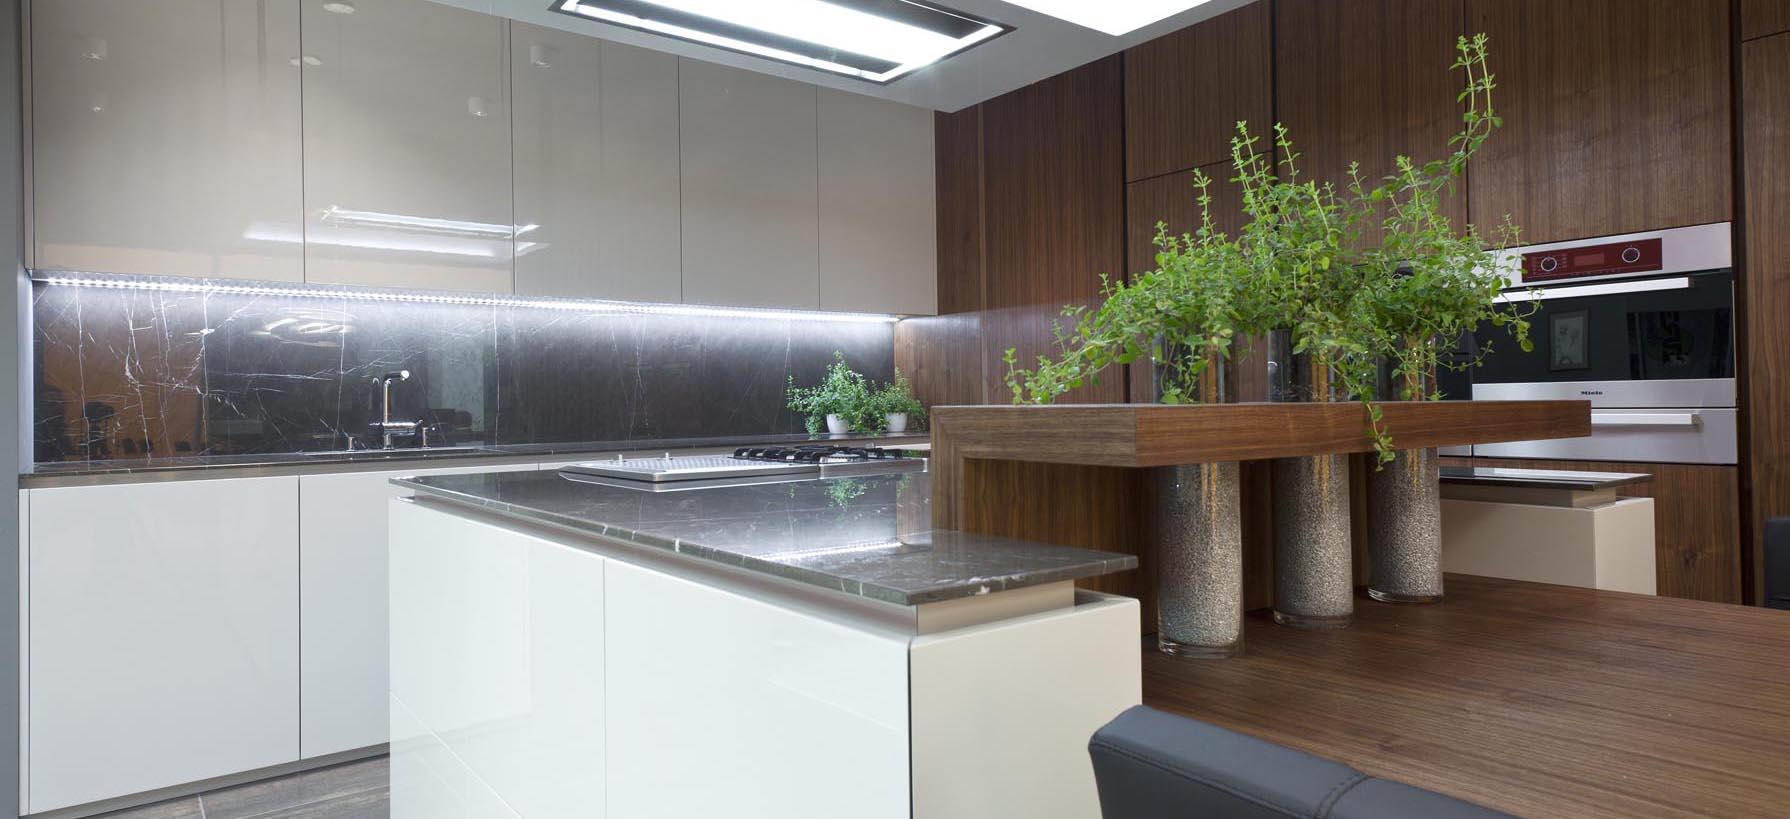 Kuhinja visoki sijaj s sivim pultom